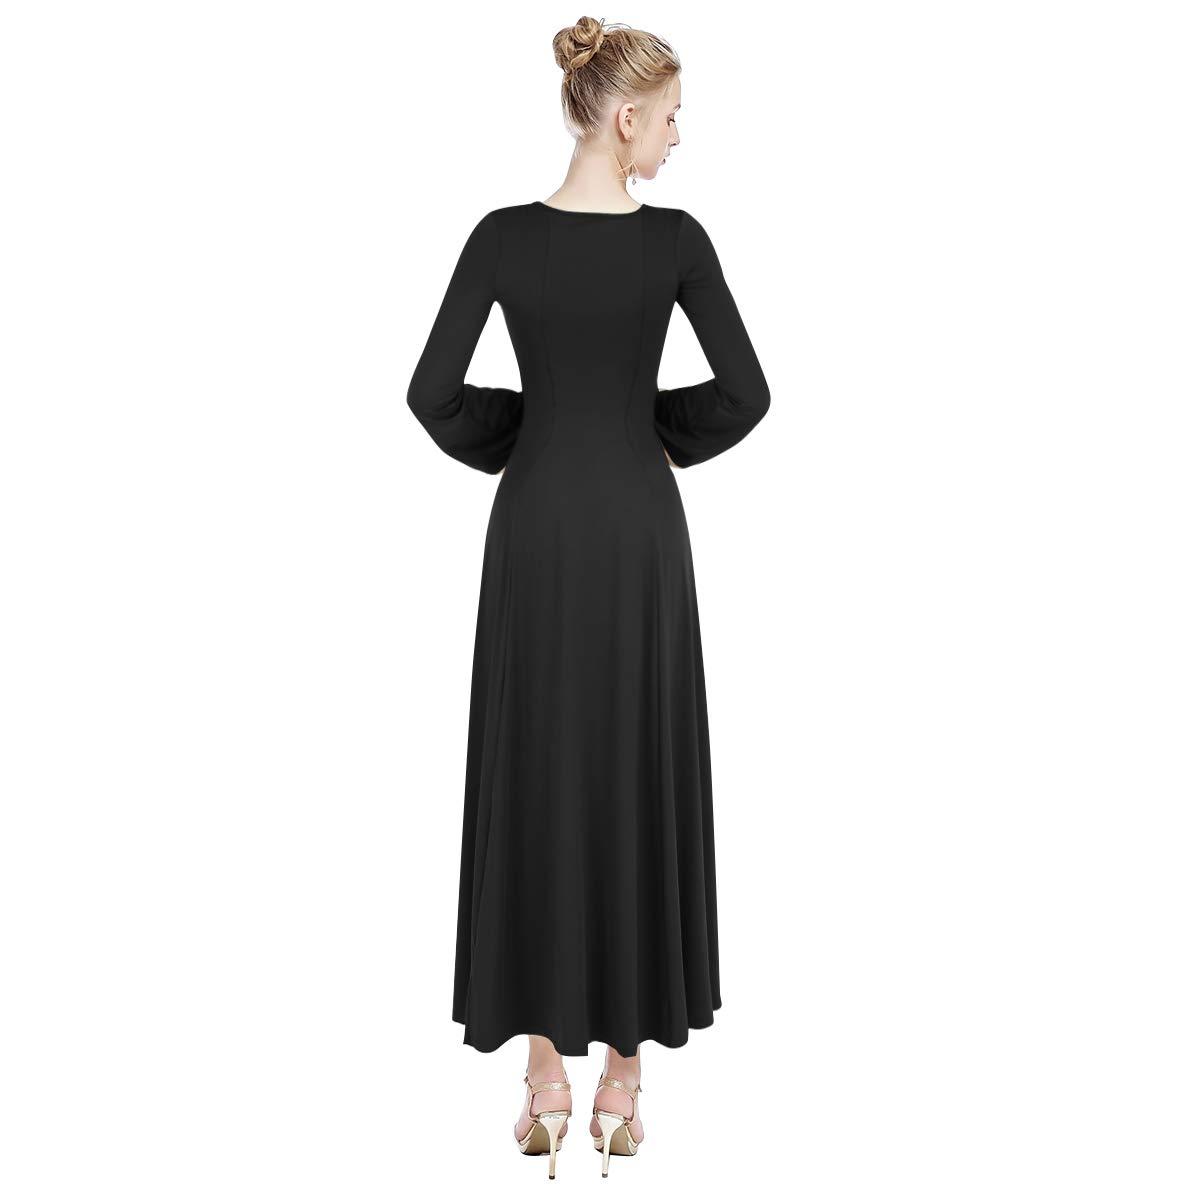 be9e65964b4 Amazon.com  IMEKIS Women Metallic Color Block Praise Dance Dress Liturgical  Full Length Swing Gowns Long Sleeve Dancewear Worship Costume  Clothing